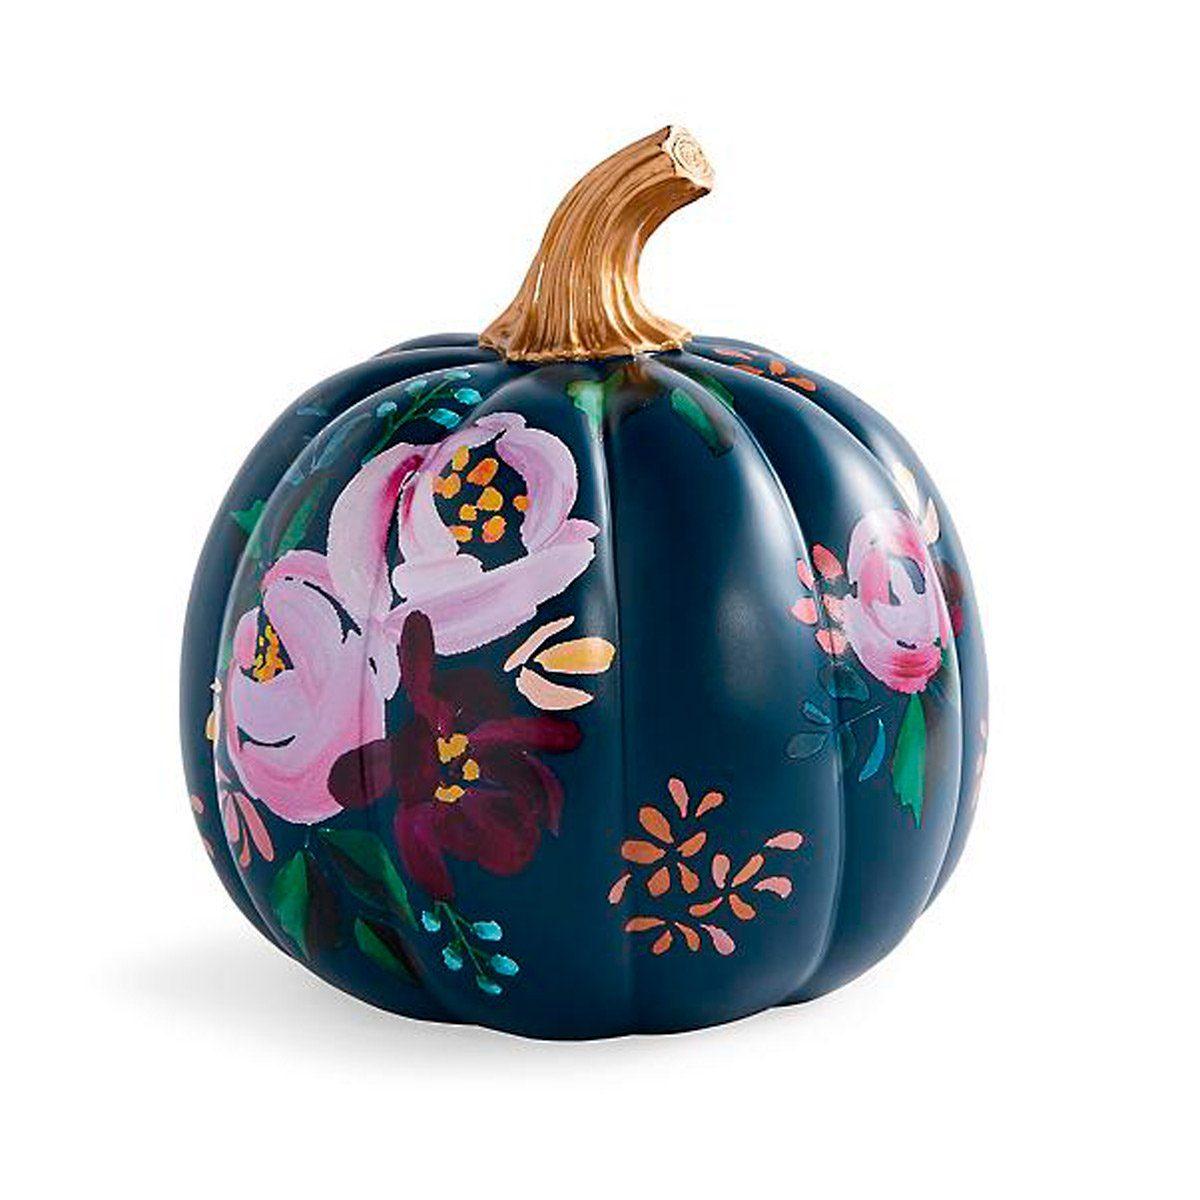 floral design on a pumpkin